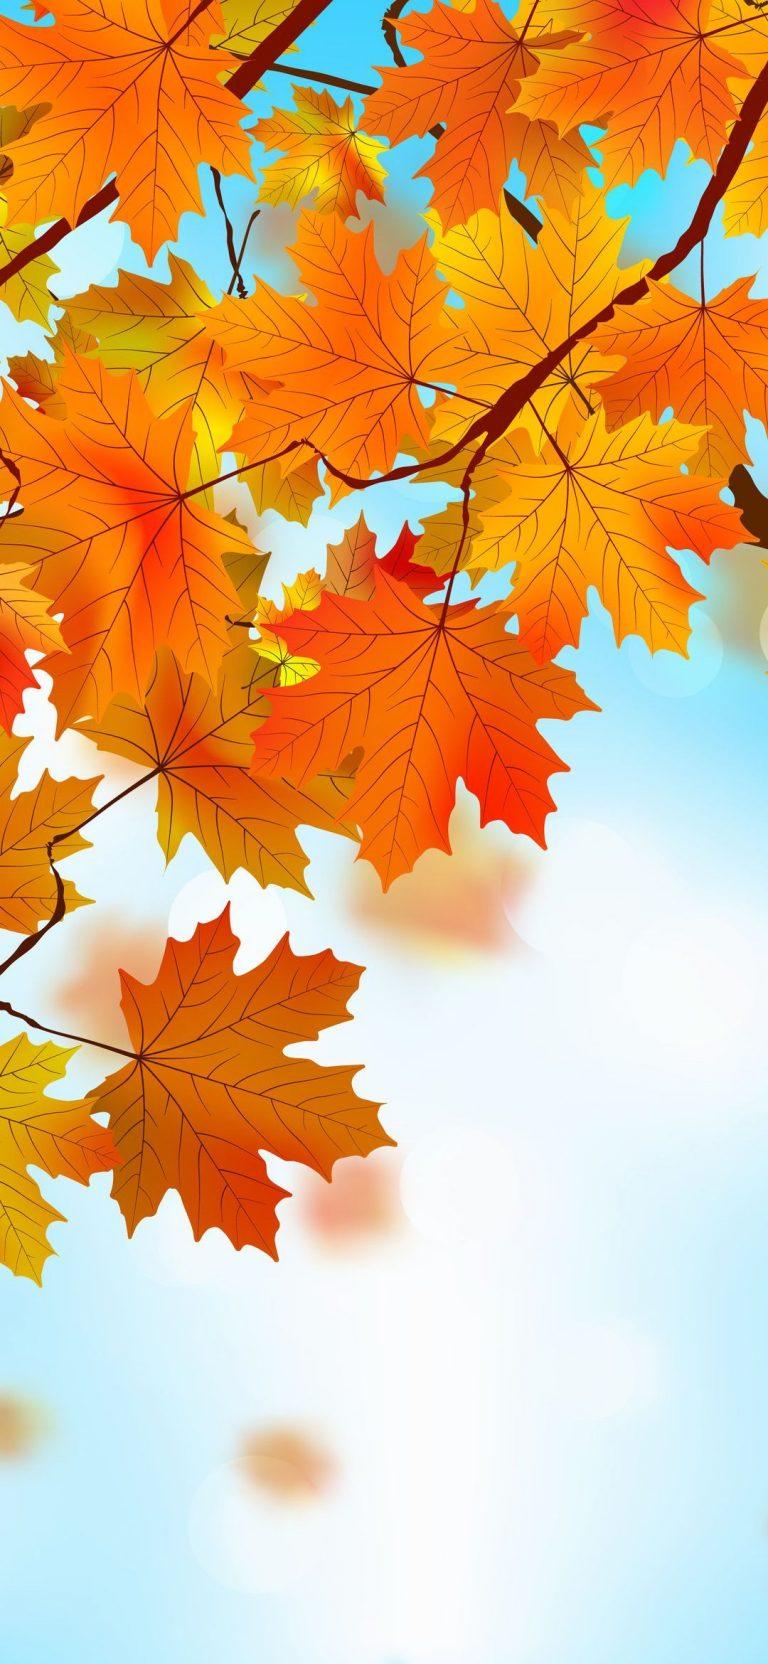 Autumn Phone Wallpaper 060 768x1664